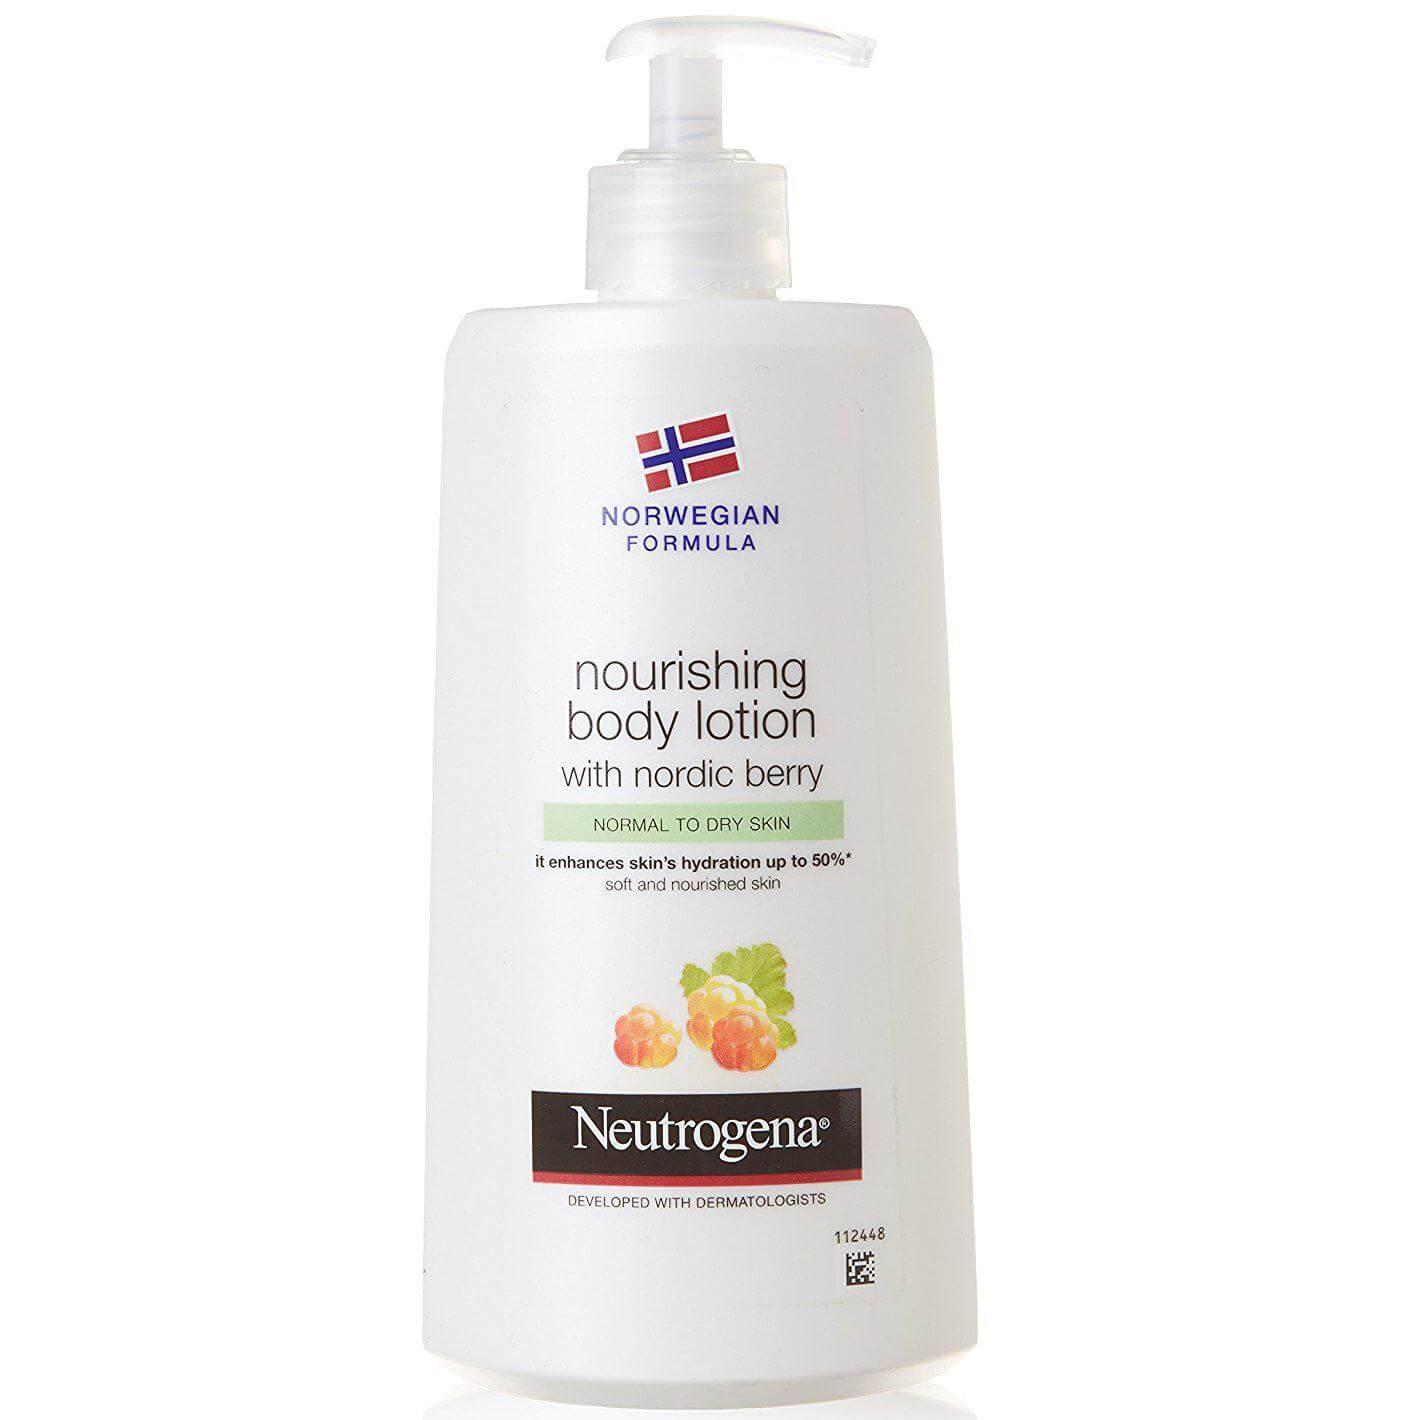 Neutrogena Nourishing BodyLotionΘρεπτικόΓάλακτωμαΣώματοςμε Nordic Berry για Κανονική – Ξηρή Επιδερμίδα 400mlPromo -30%